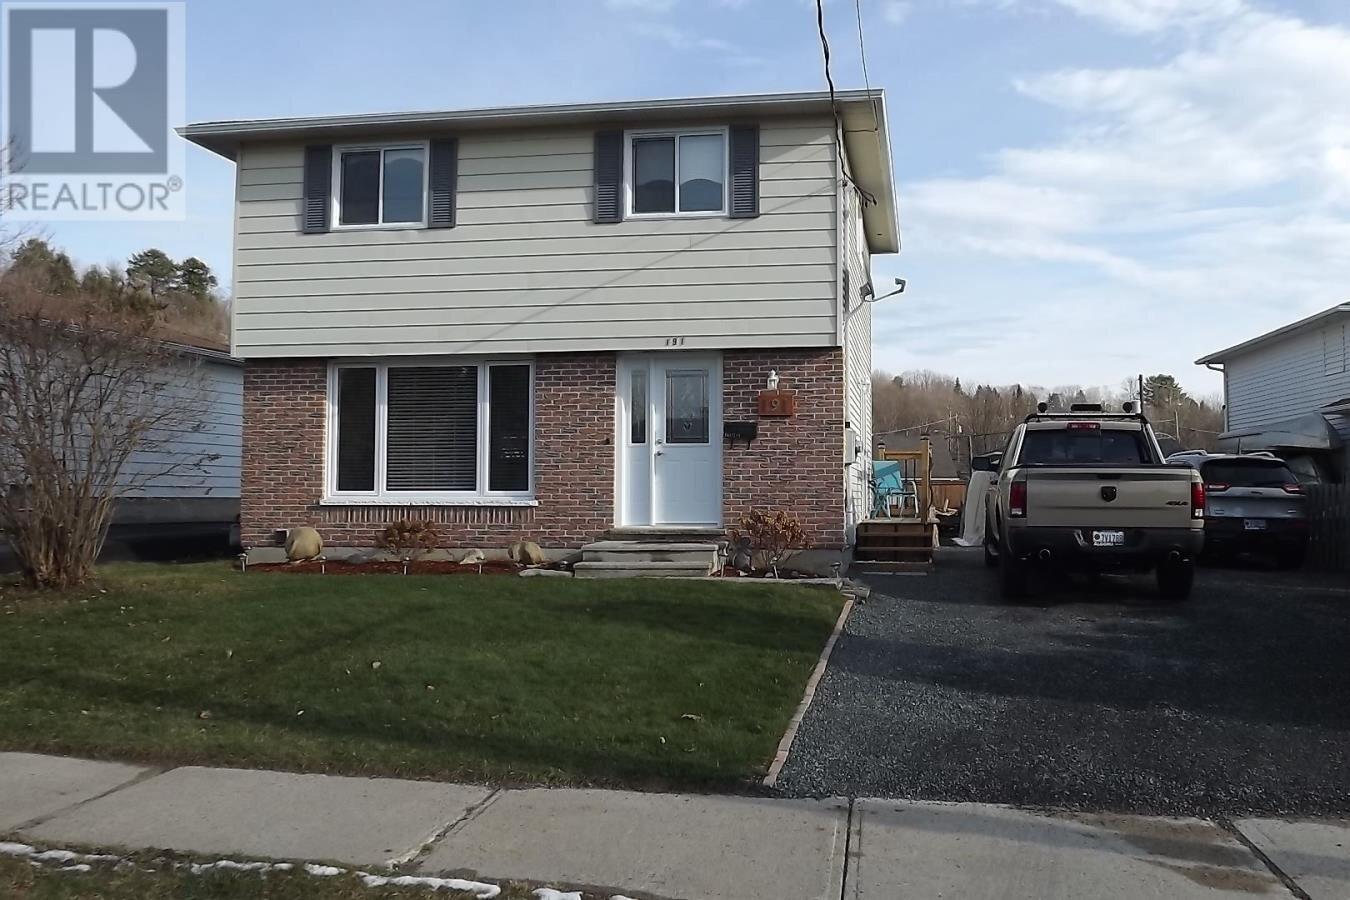 House for sale at 191 Ottawa Ave Elliot Lake Ontario - MLS: SM130331